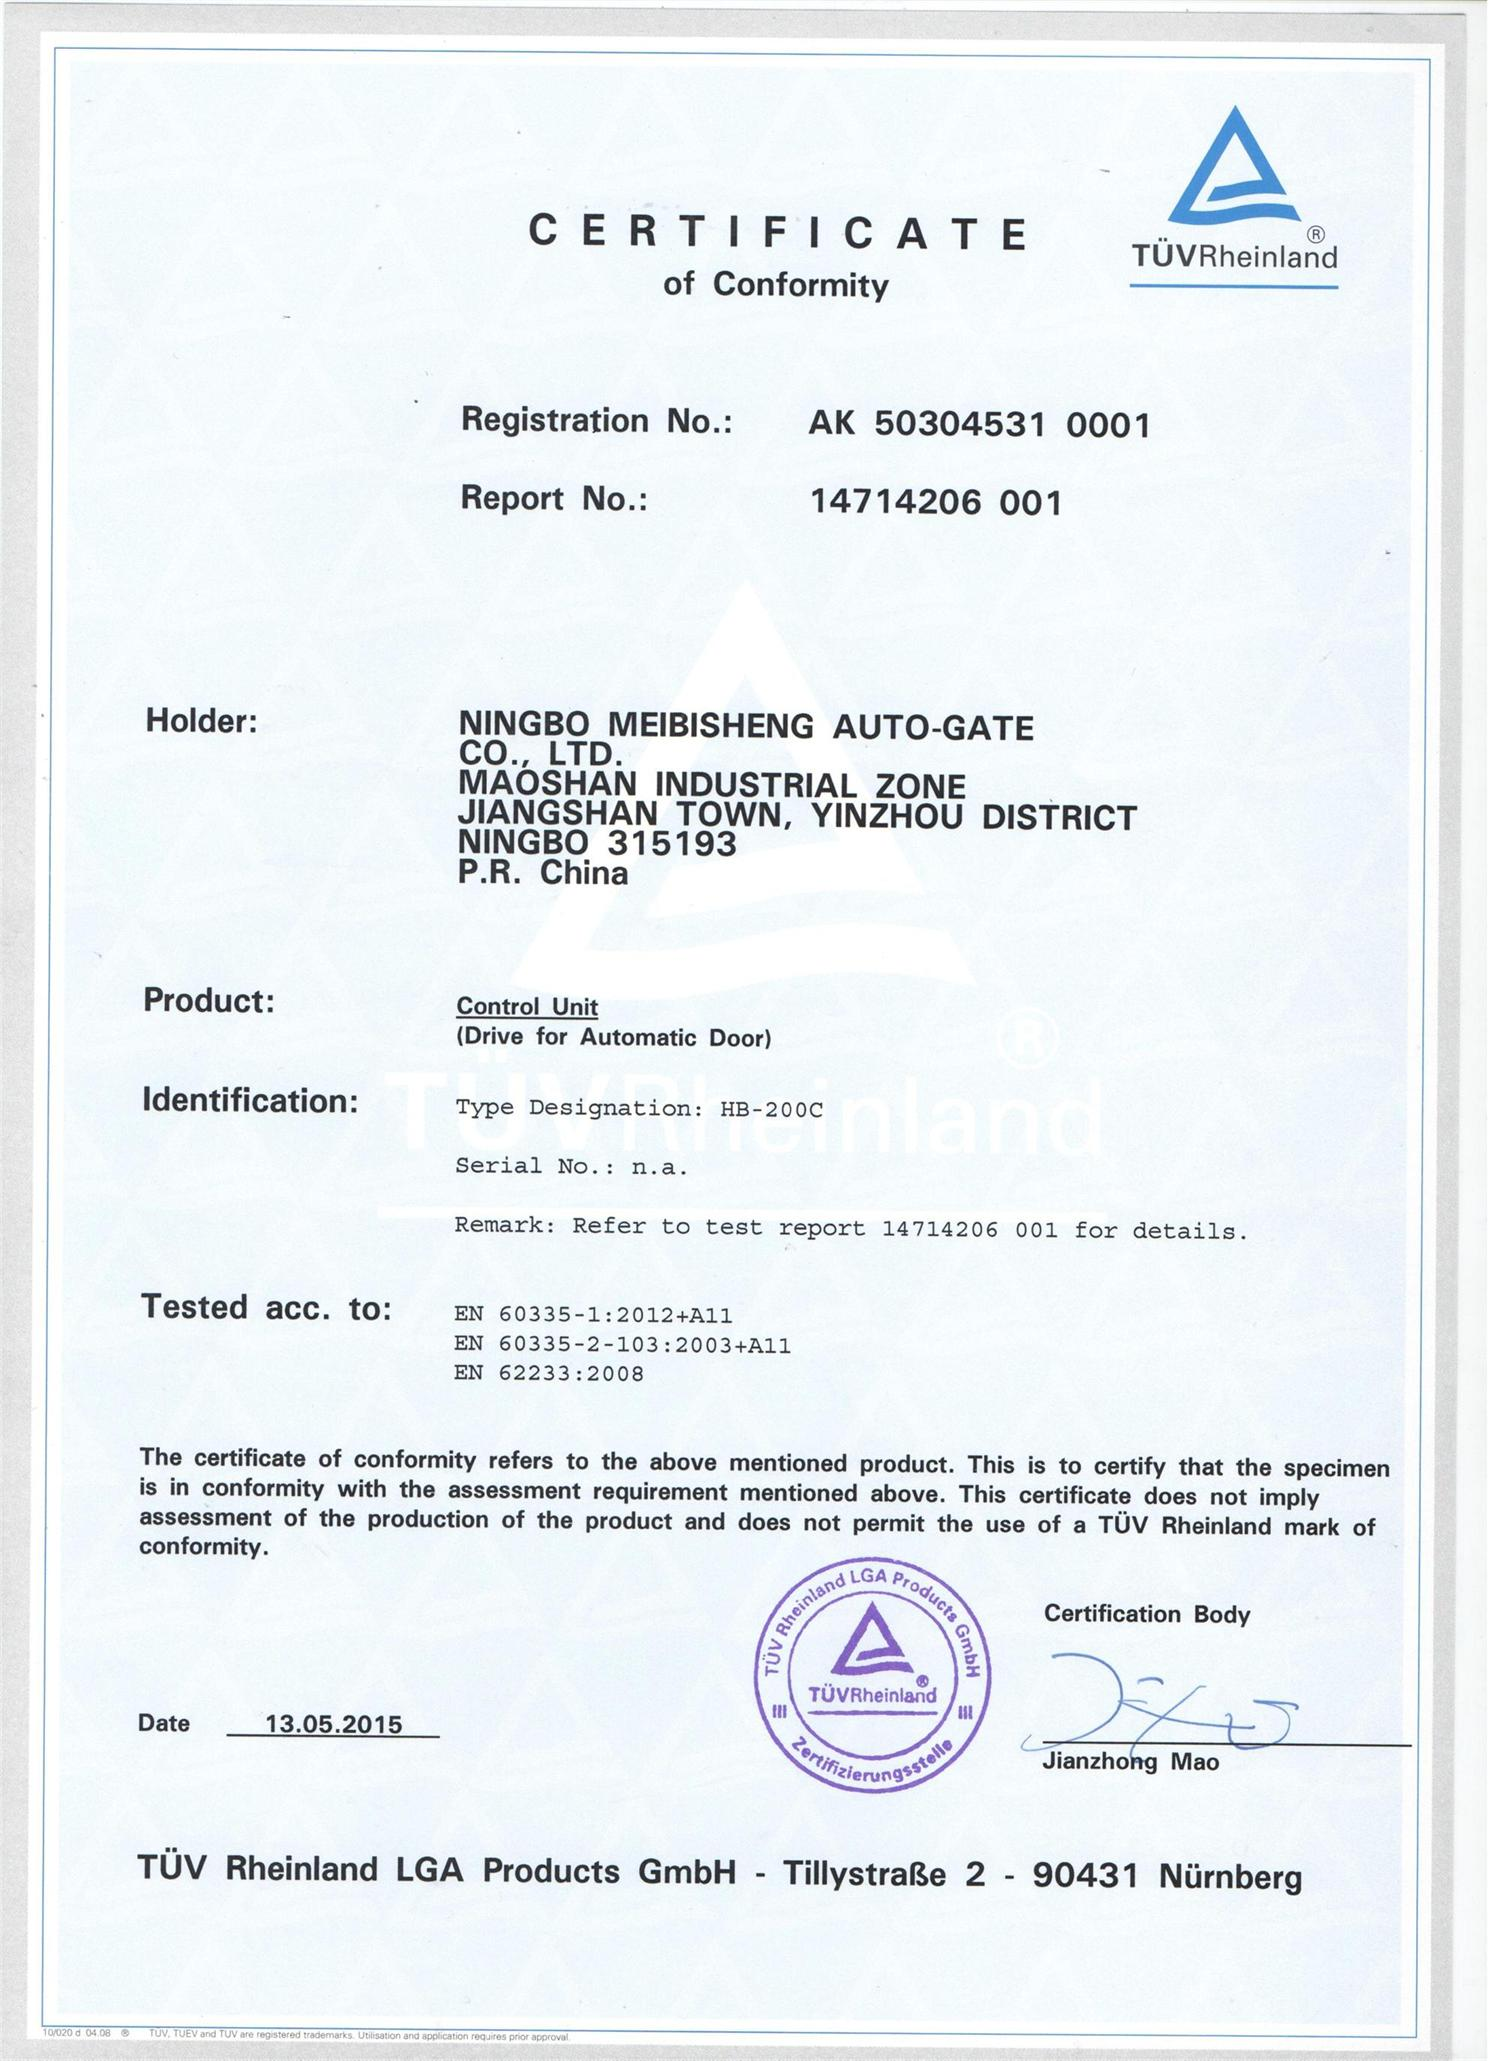 TUV Certificate For Automatic Door